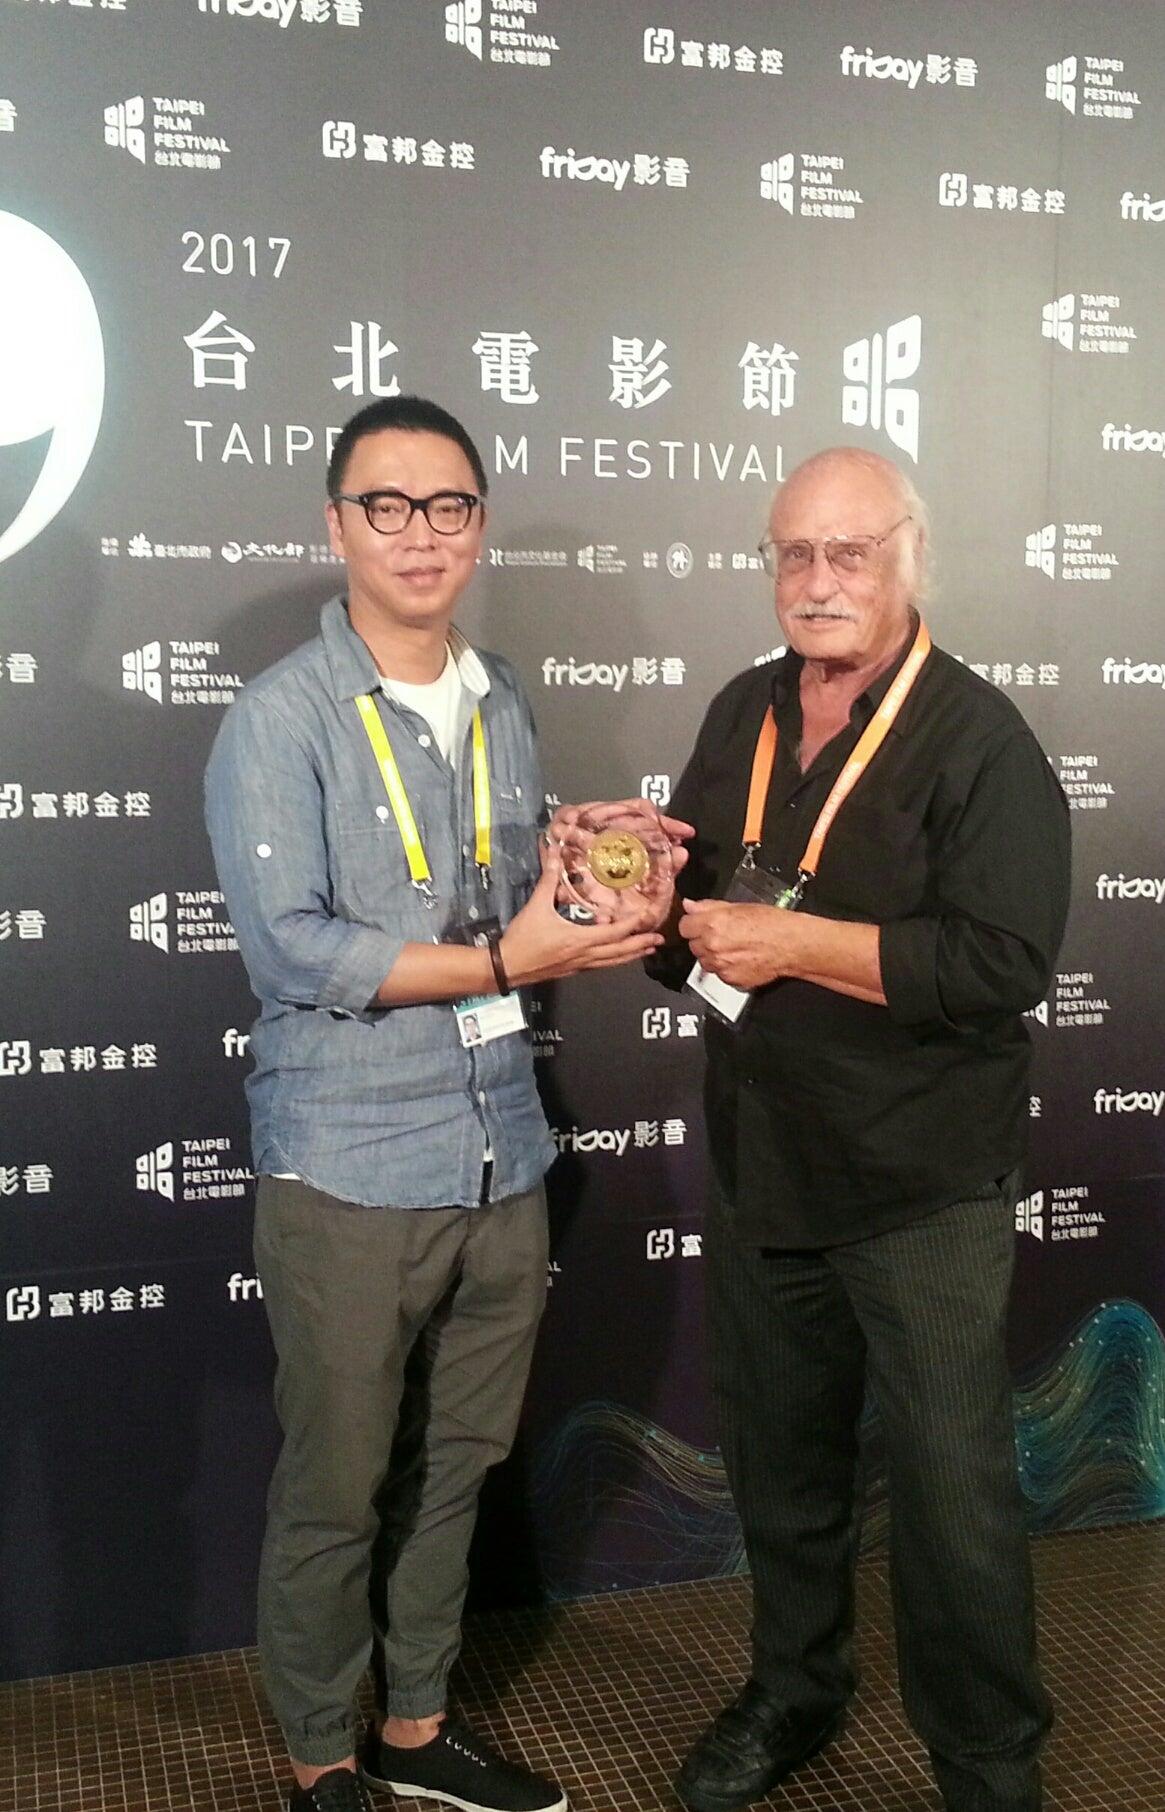 Taipei Festival director Shen and HFPA board member Yoram Kahana